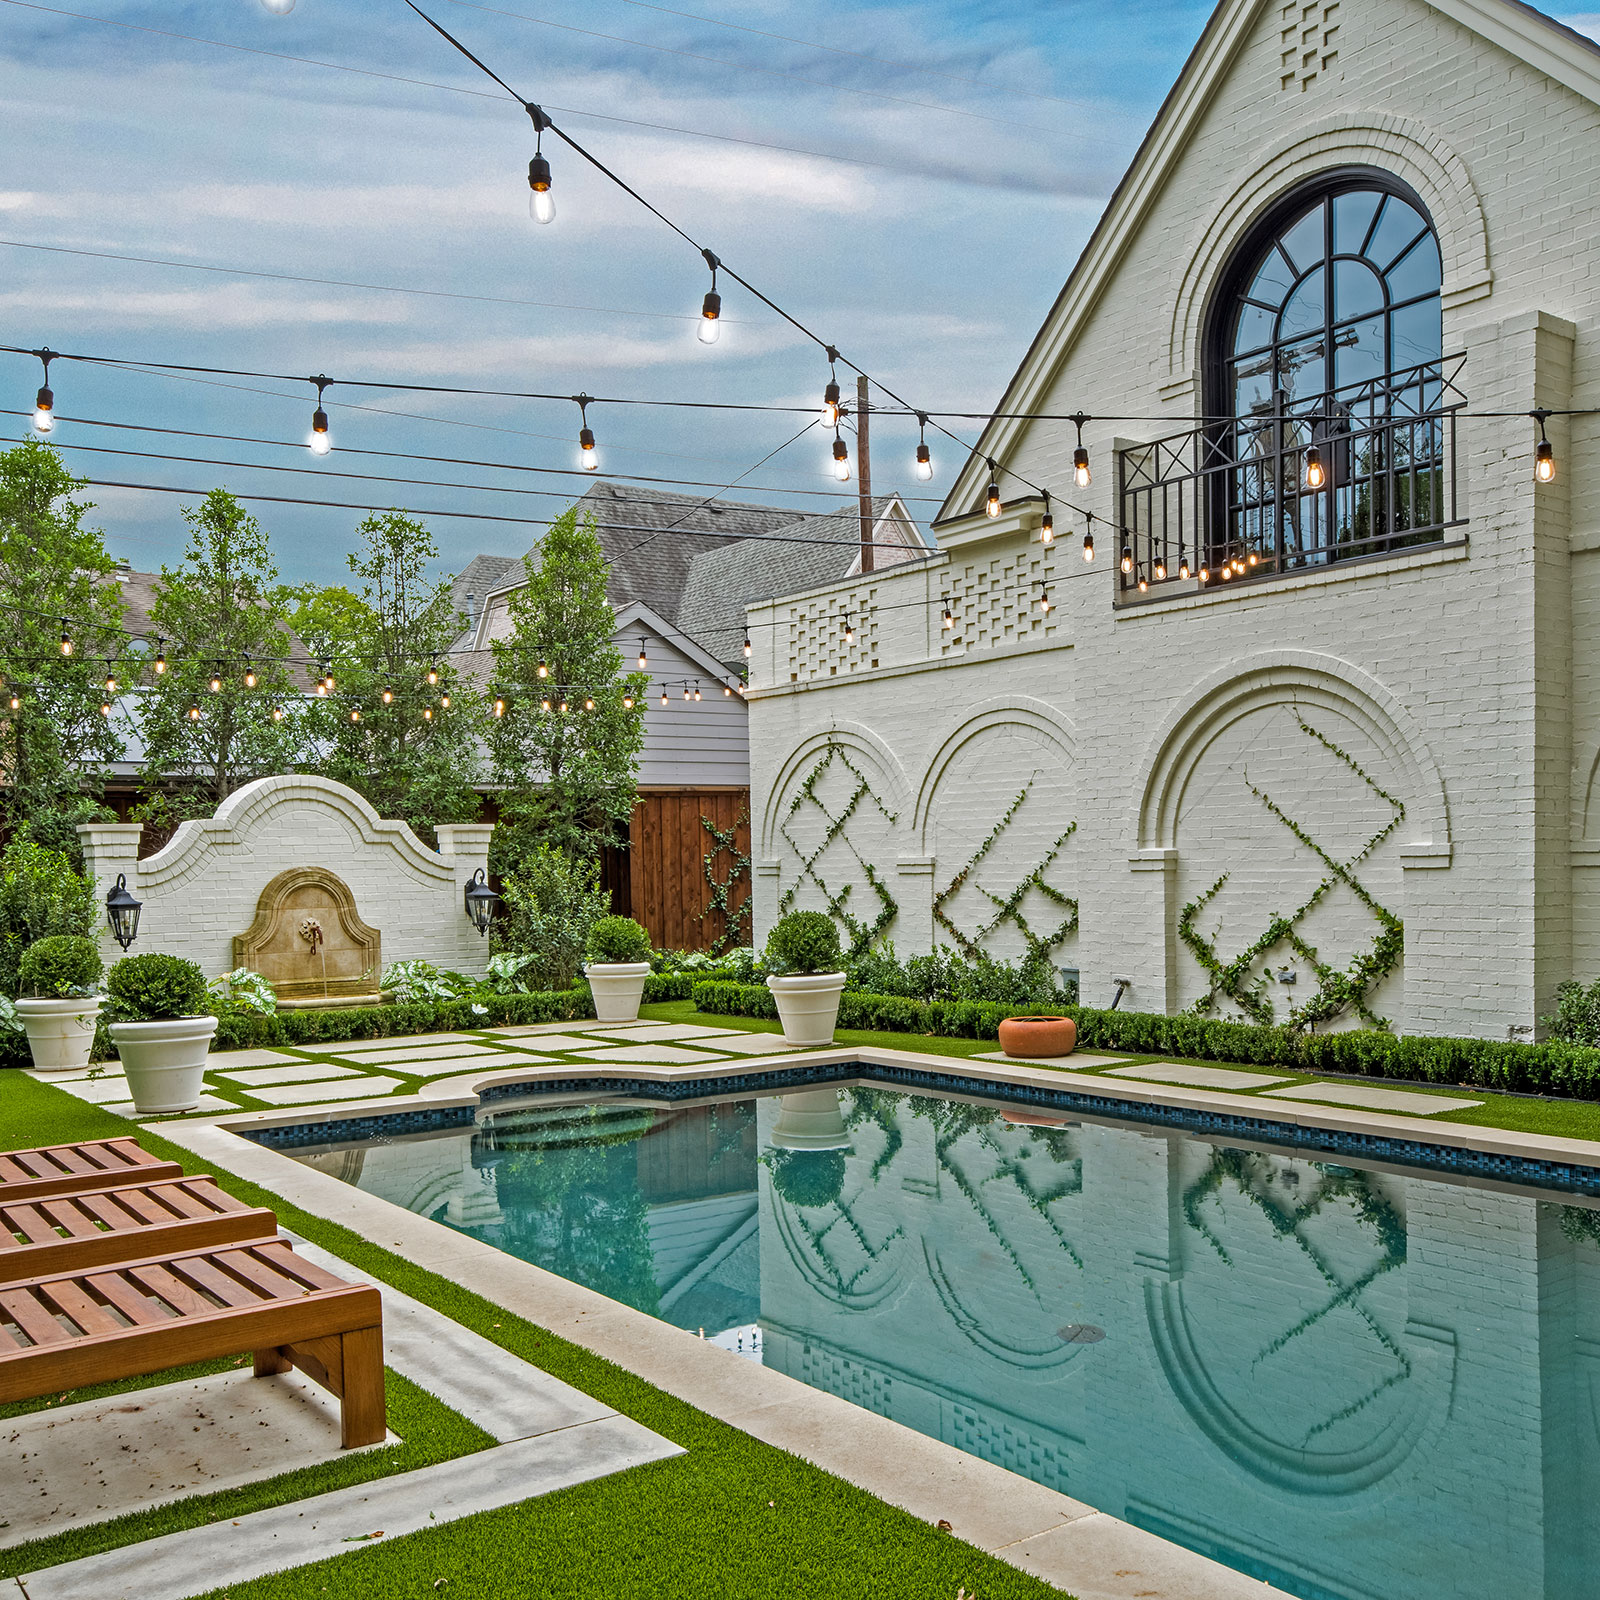 ddla-design-windsor-pool-garden.jpg